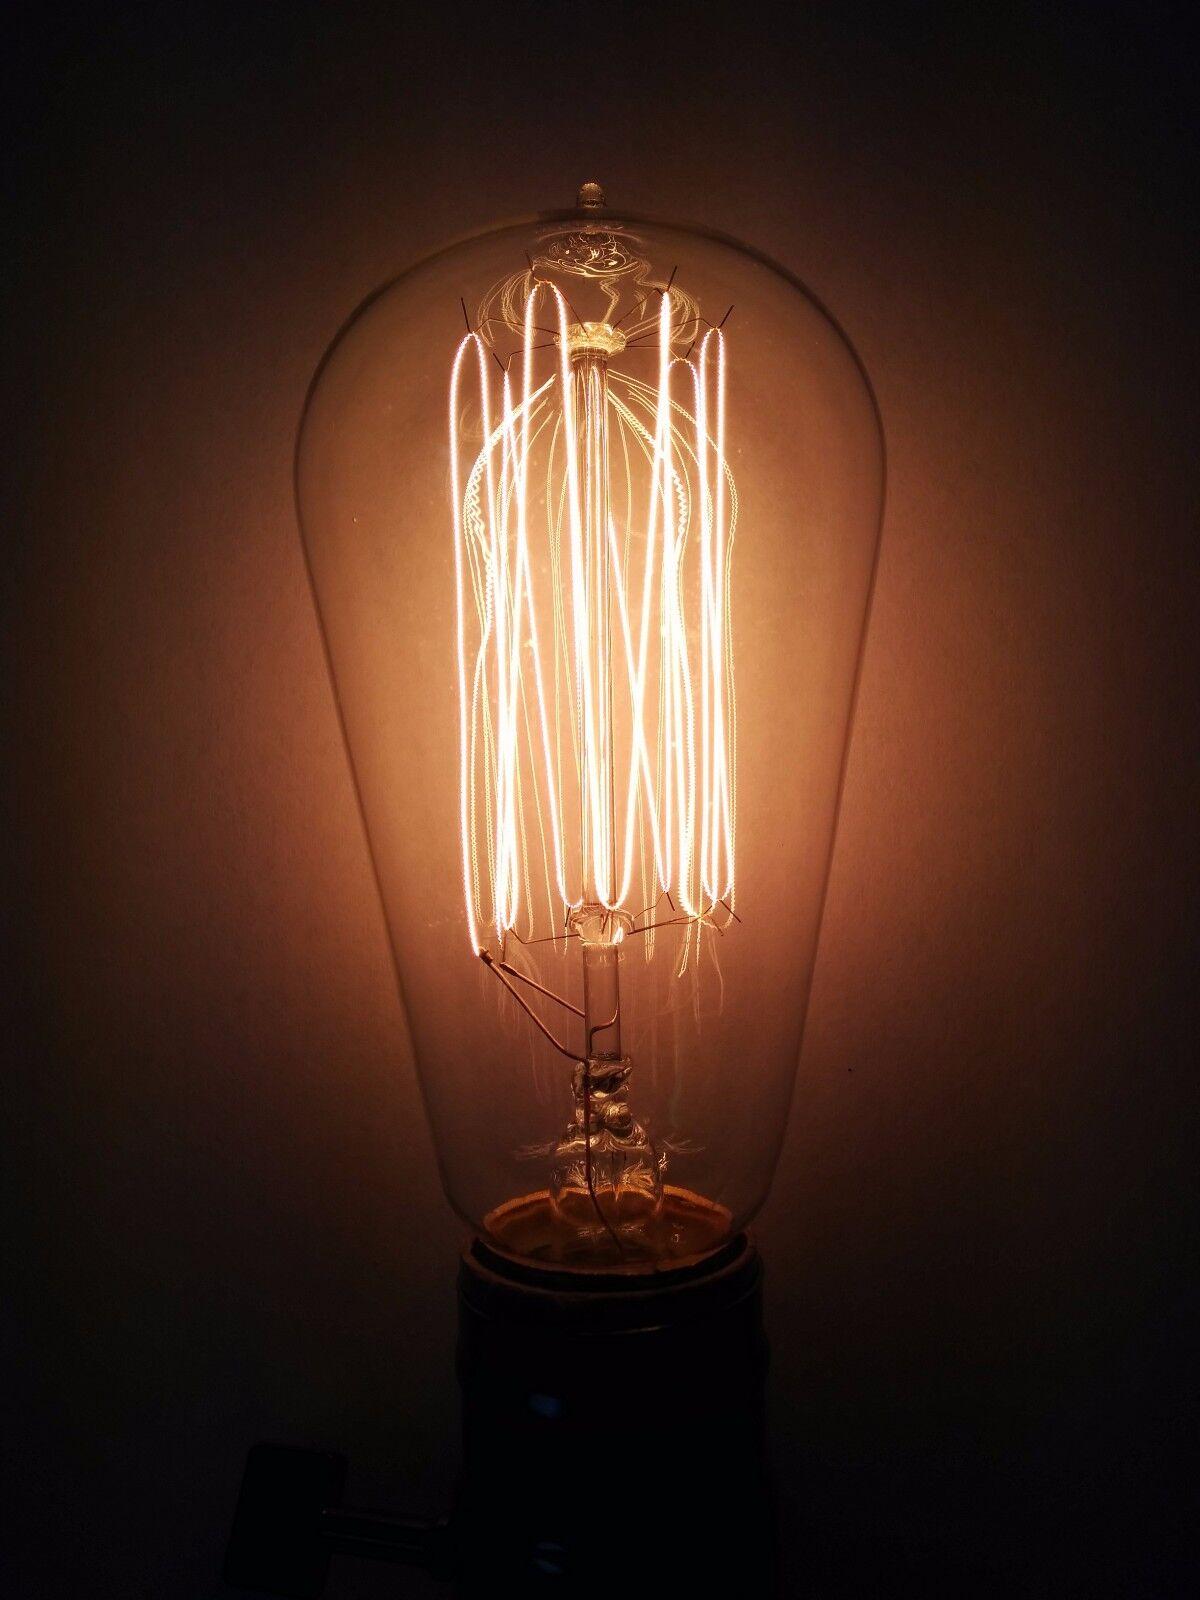 (10PK)Simple Vintage ST58 Edison Light Bulb 60W 120V Antique Clear Squirrel Cage